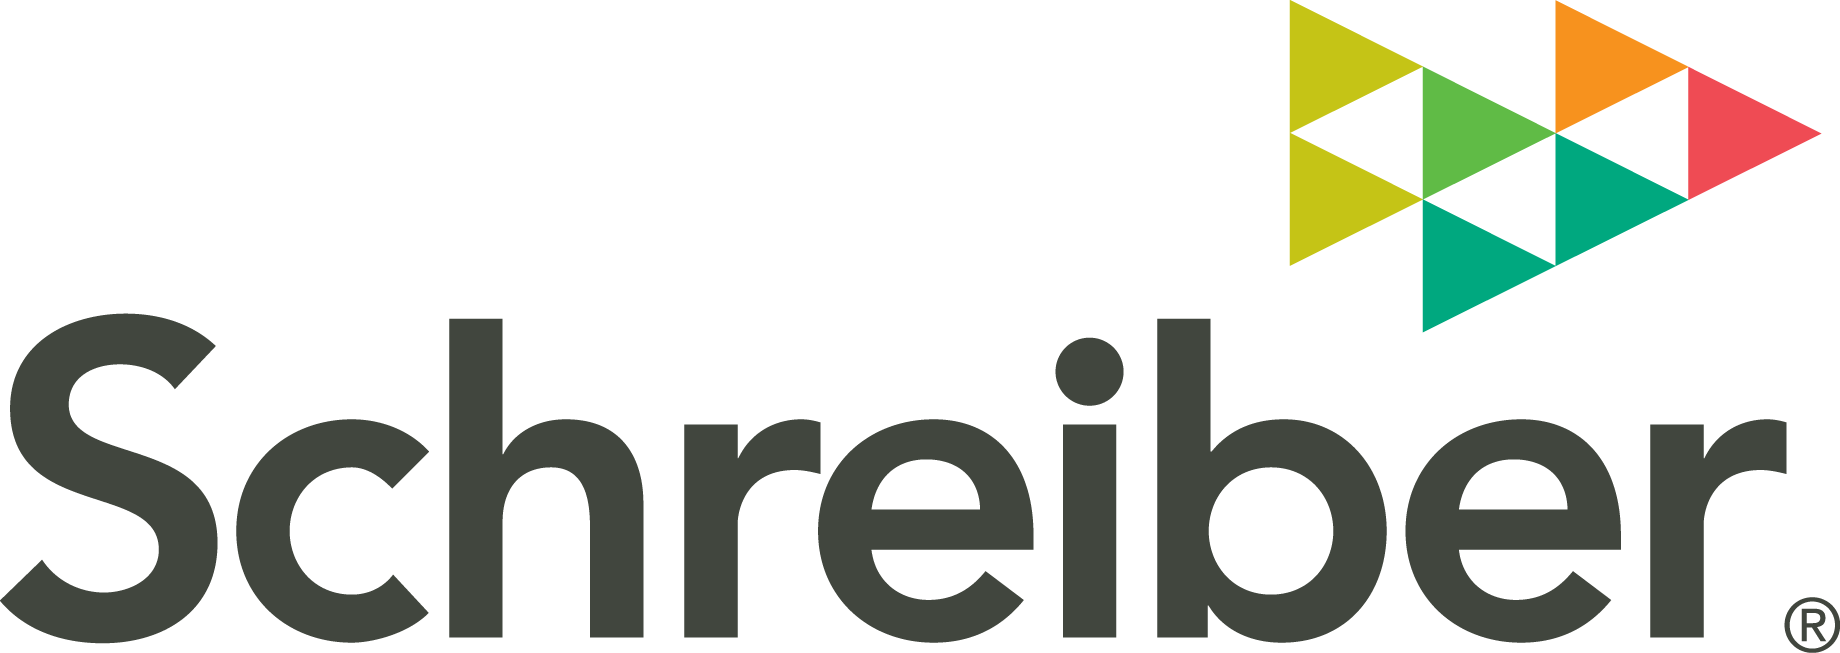 schreiber-logo-hi-res-color